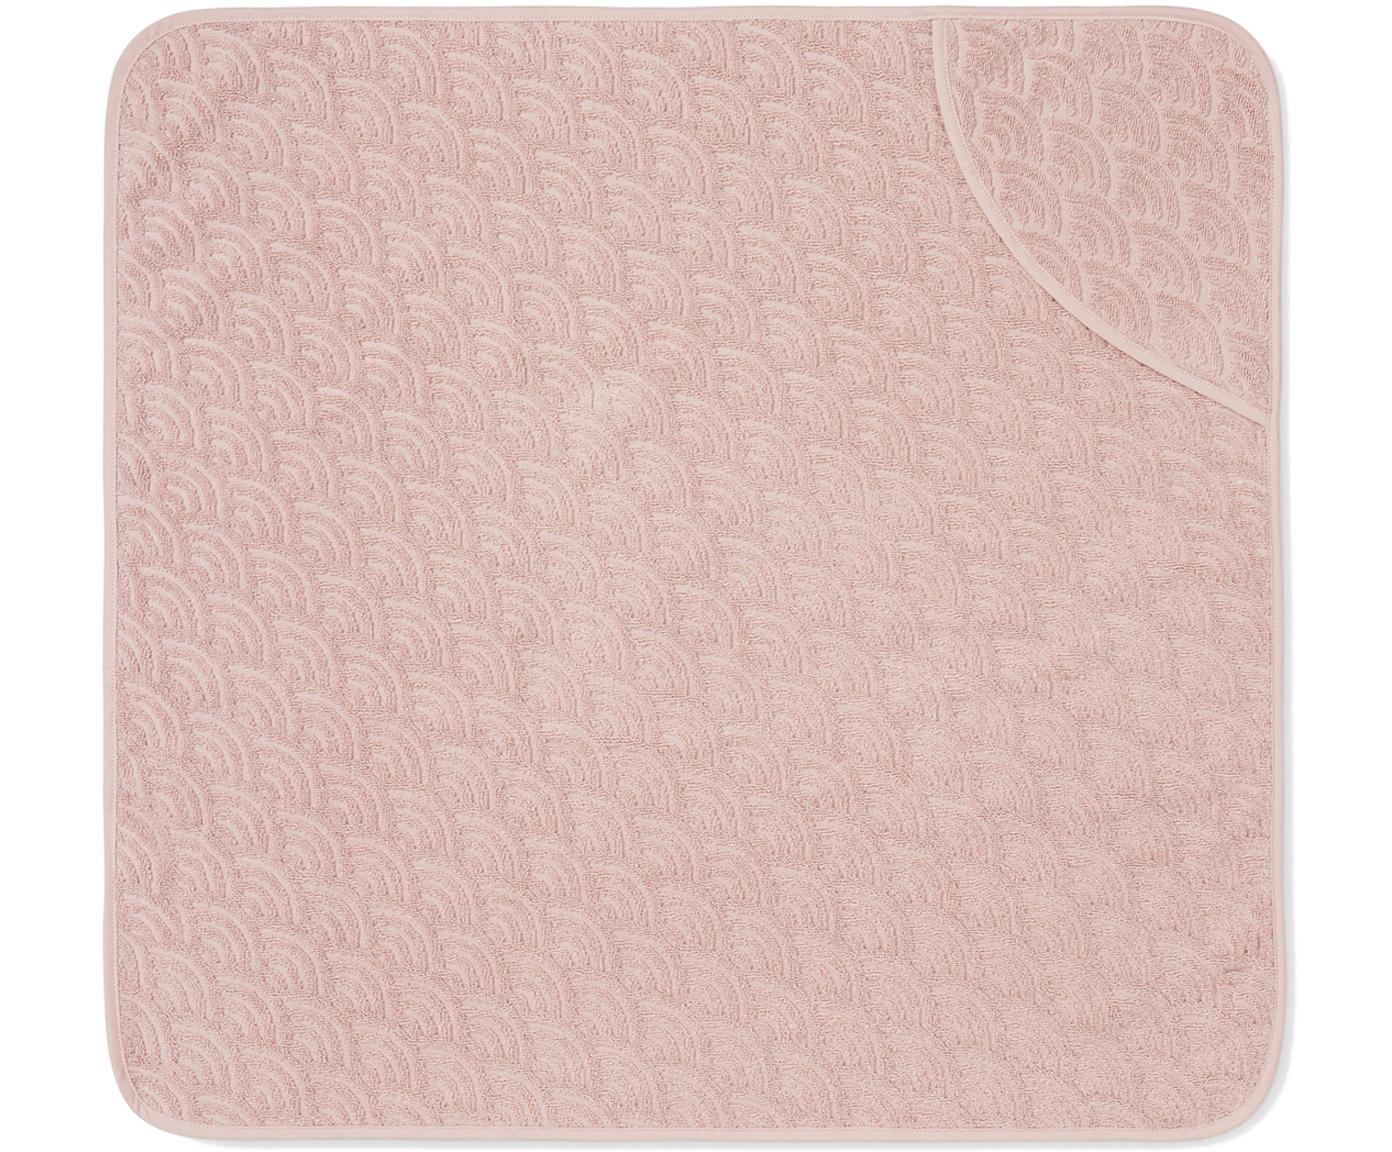 Badcape Wave, Organisch katoen, Roze, 80 x 80 cm